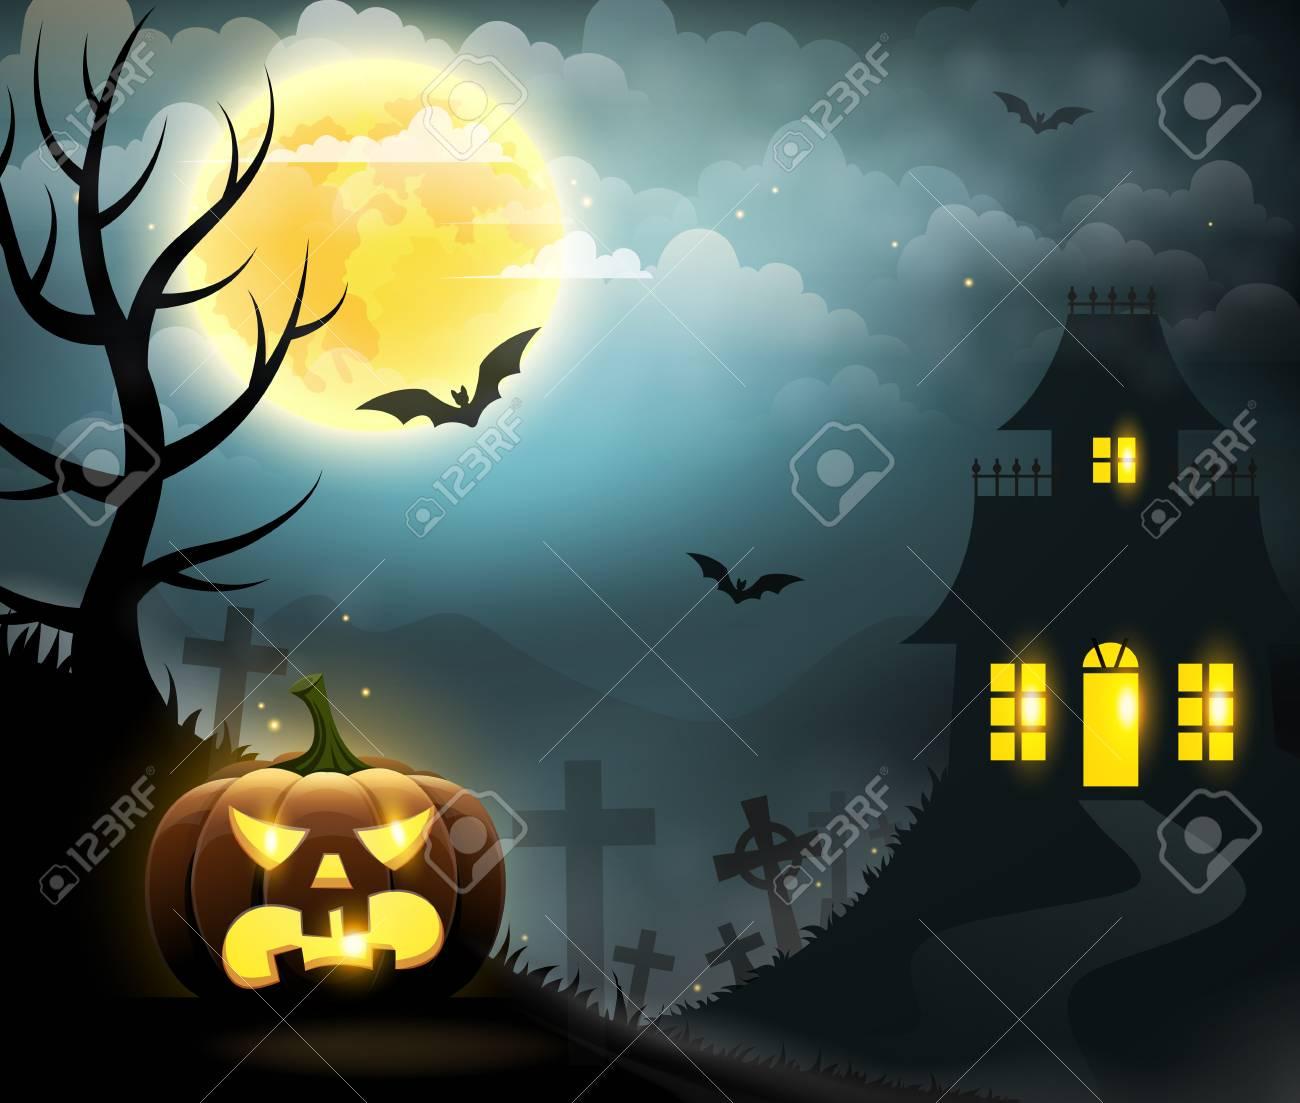 scary house, spooky pumpkin, full moon, graveyard and bats